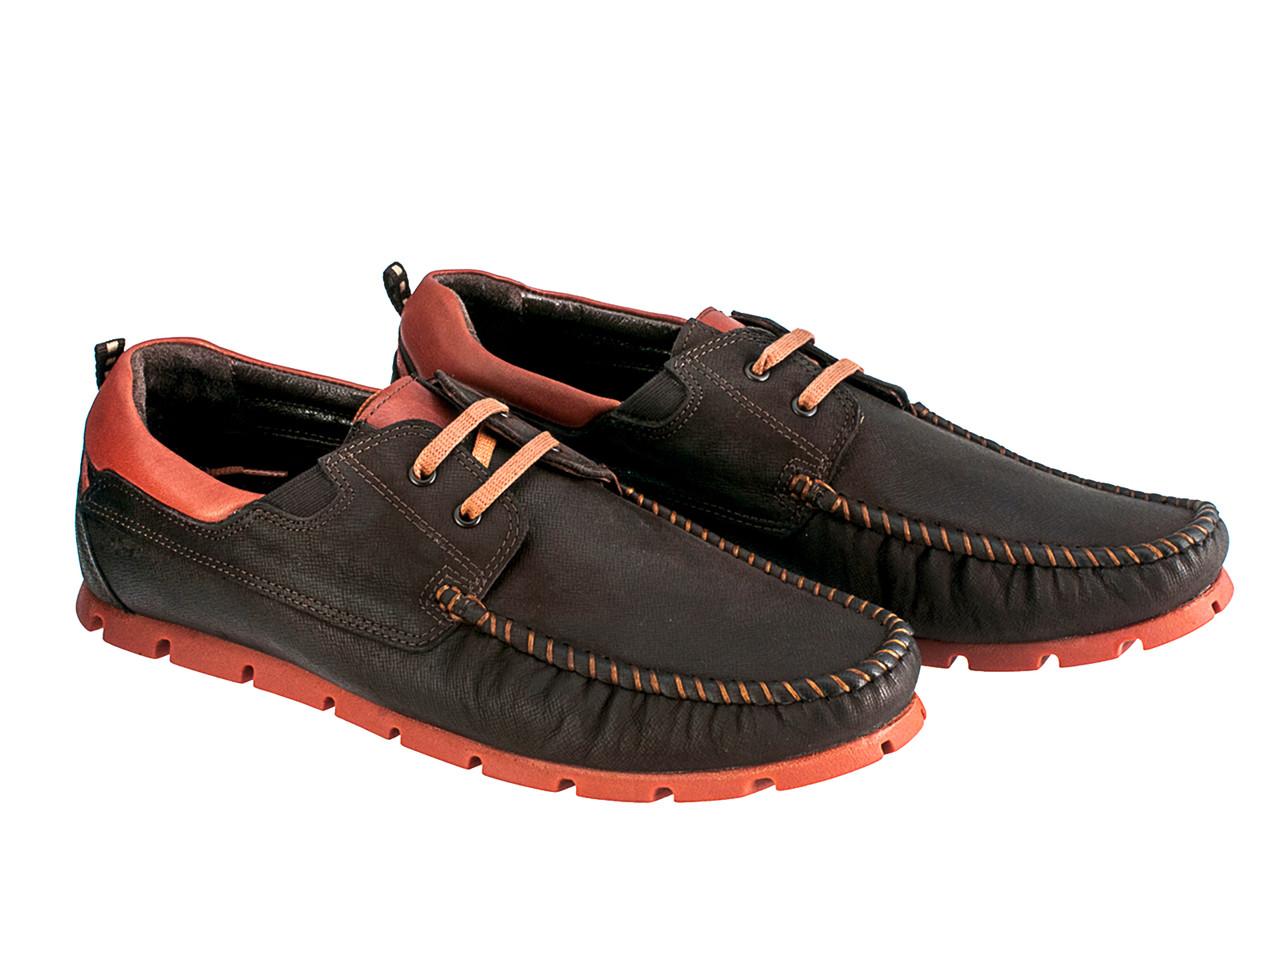 Мокасины Etor 13651-16654-275 42 коричневые